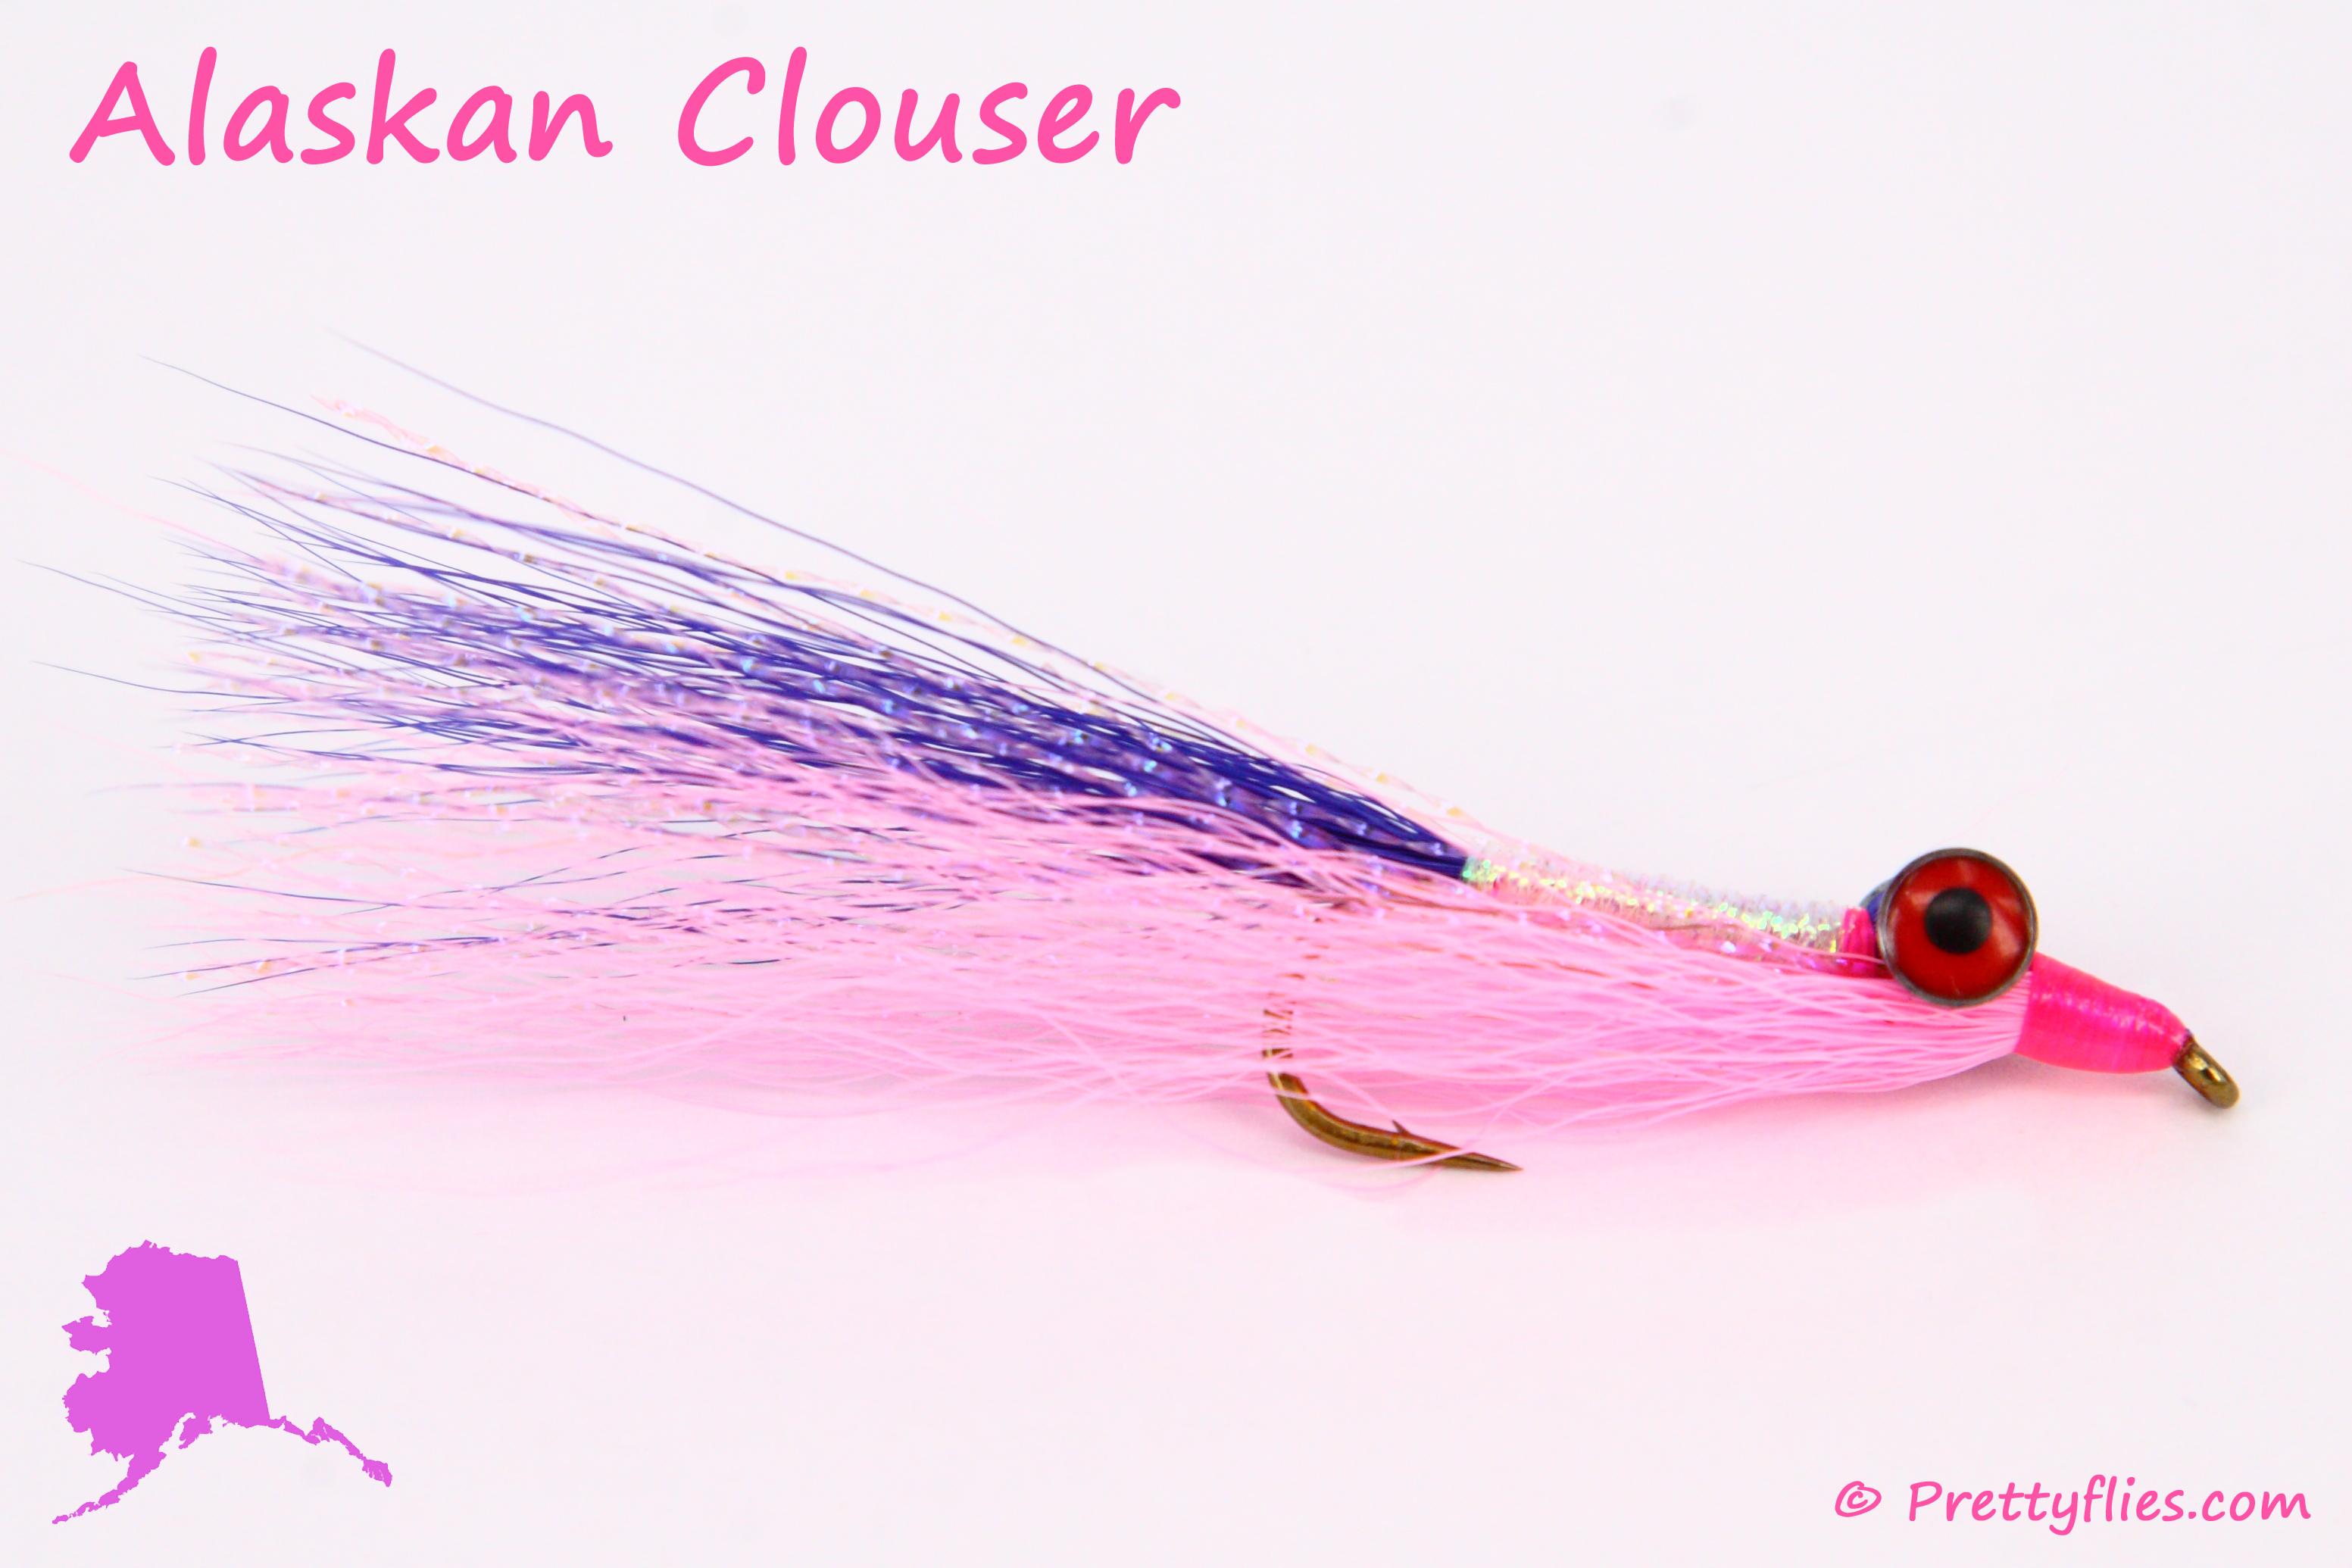 Alaskan Clouser.jpg